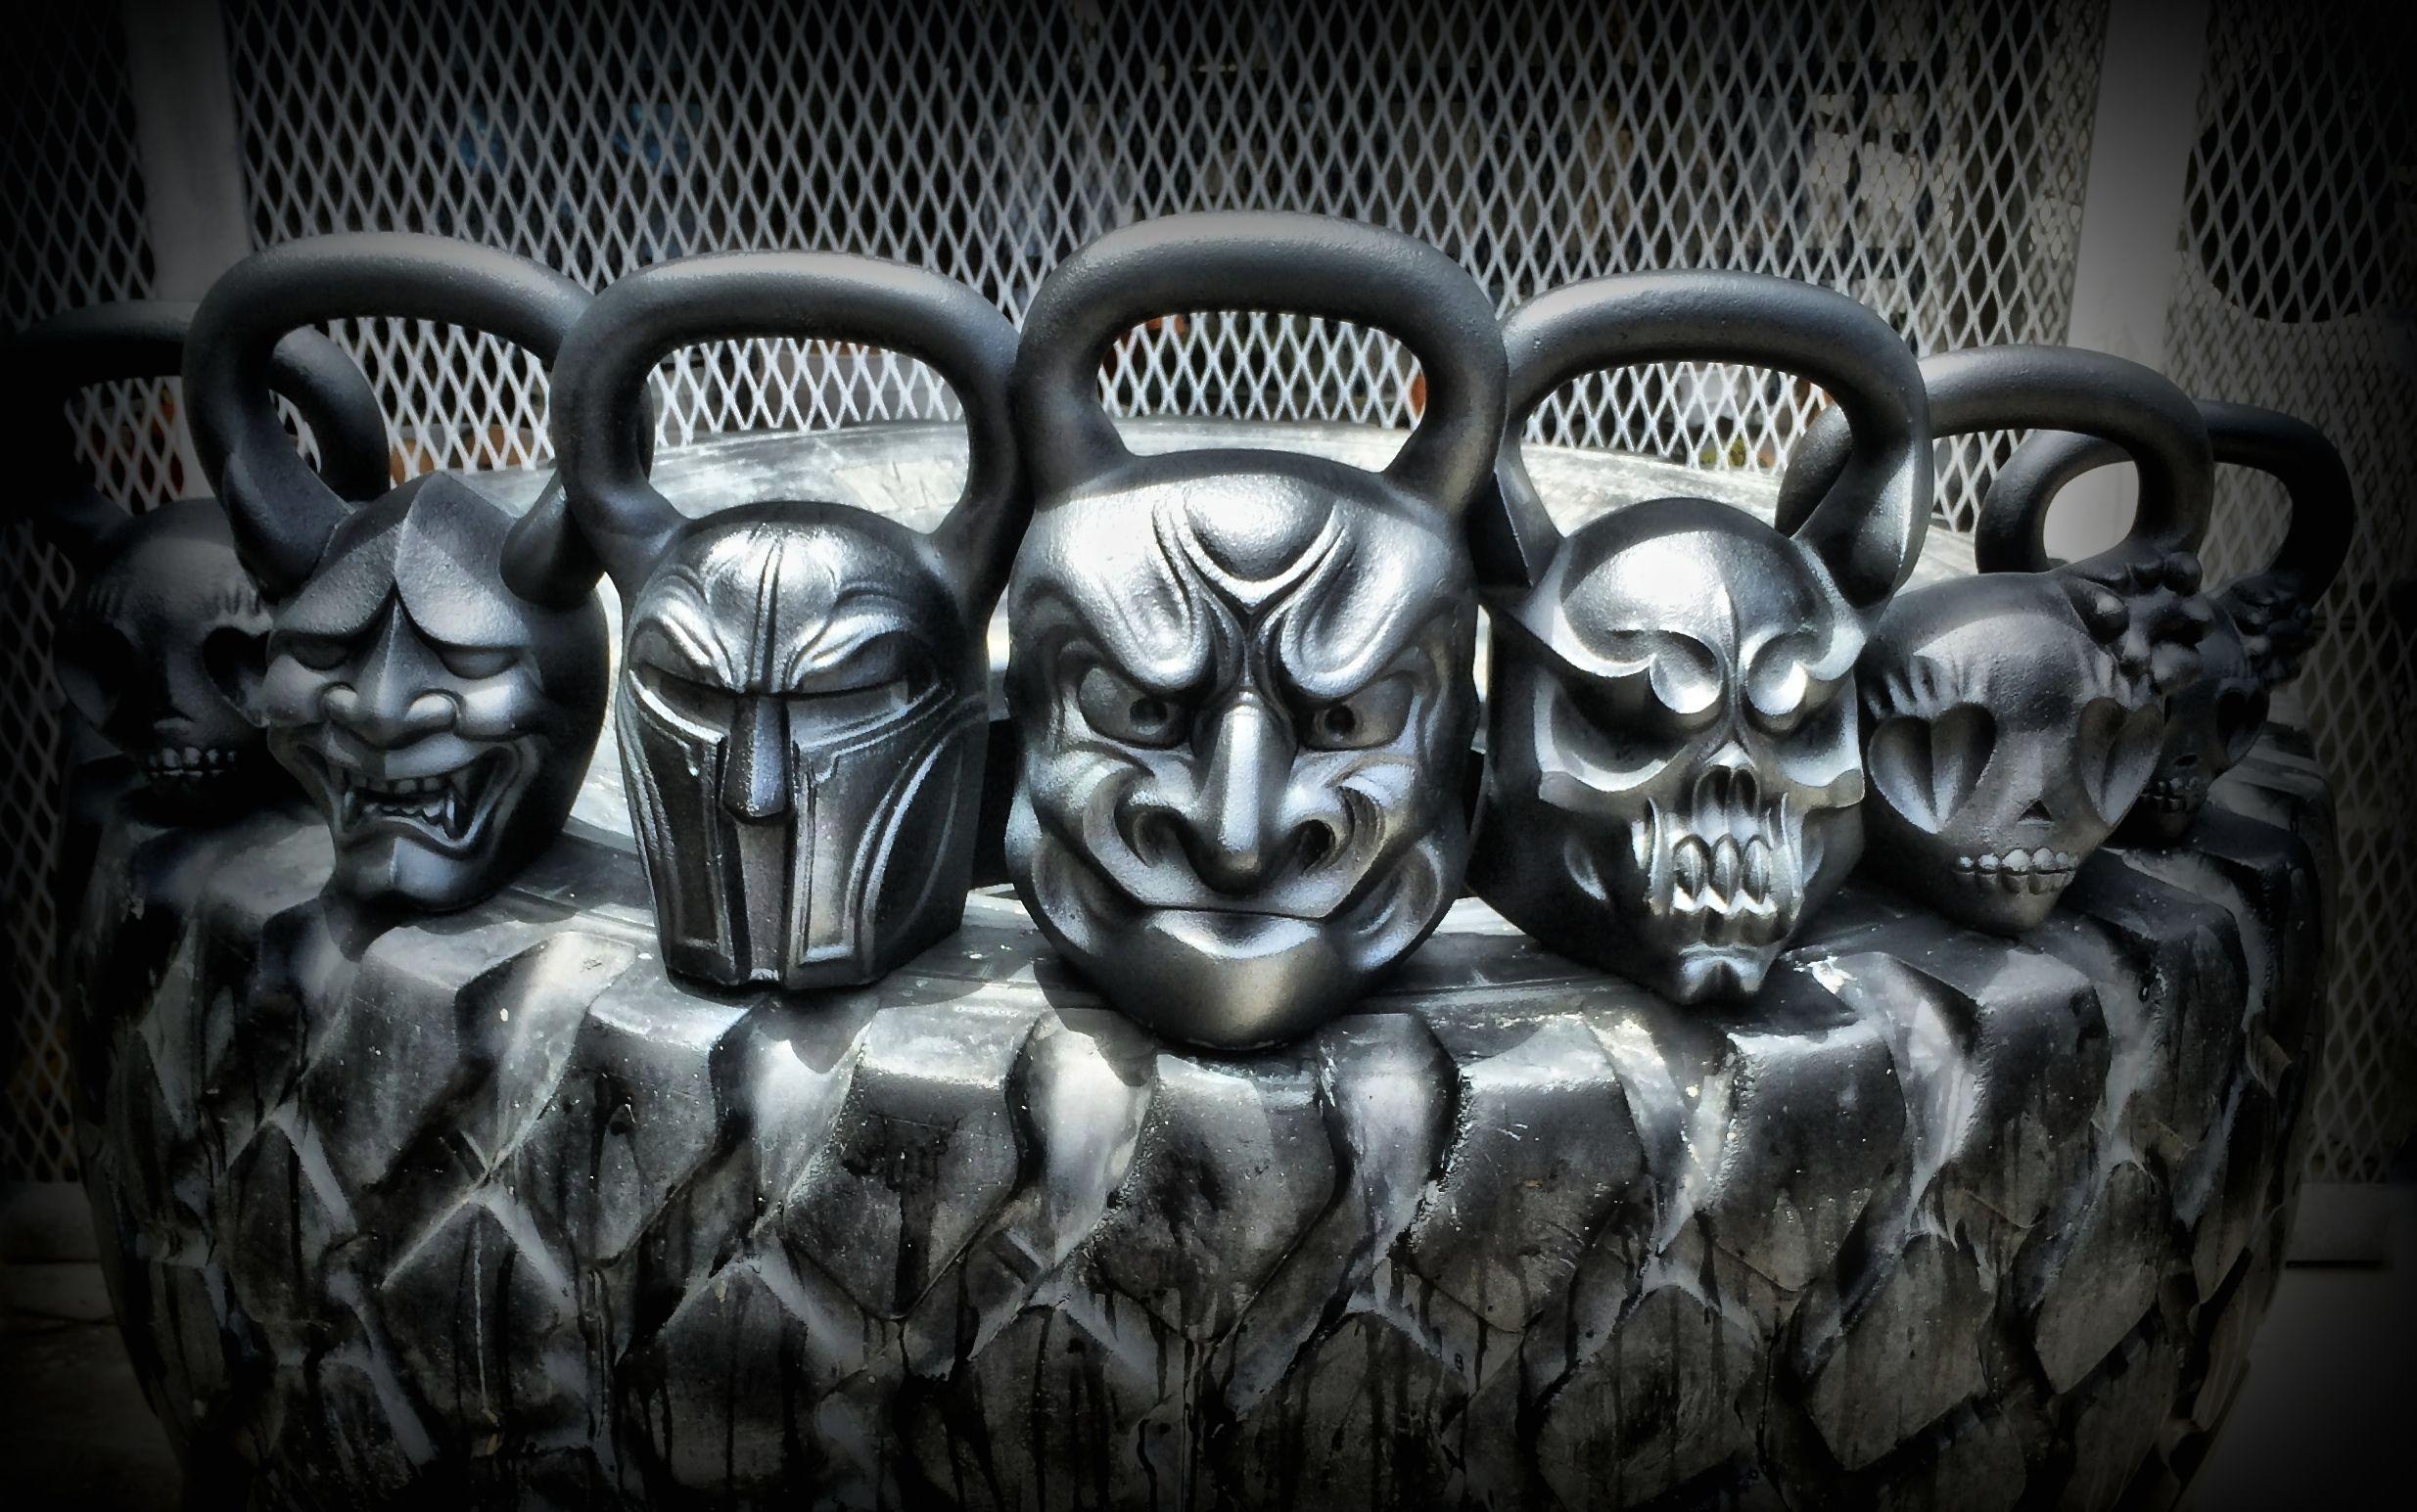 Performance Line of DemonBells  100% made in the USA http://www.demonbells.com/Default.asp